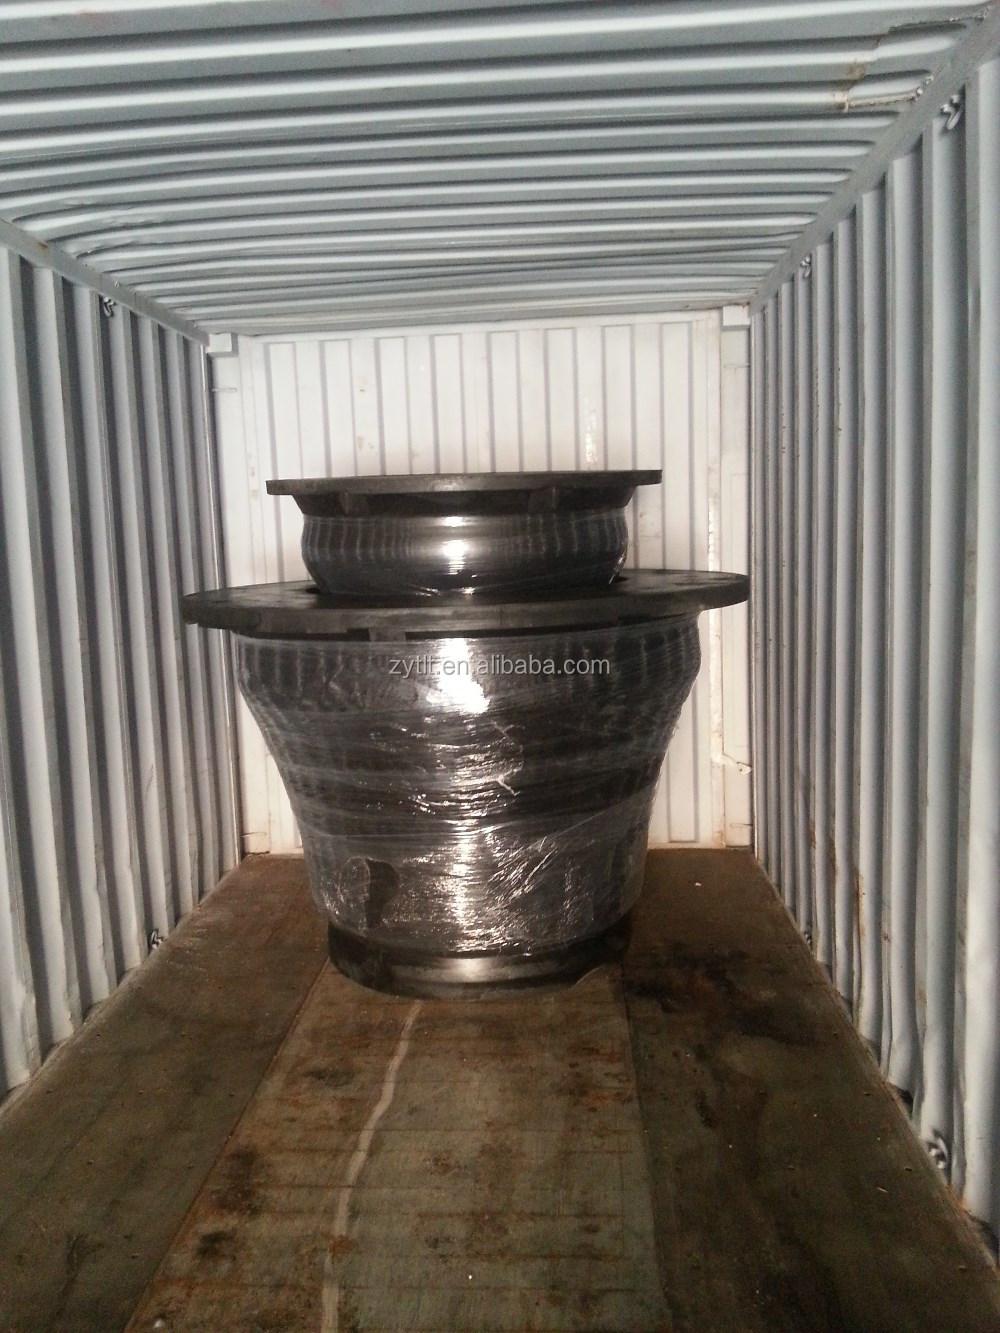 PIANC 2002 international standard super cone marine rubber fender for quay